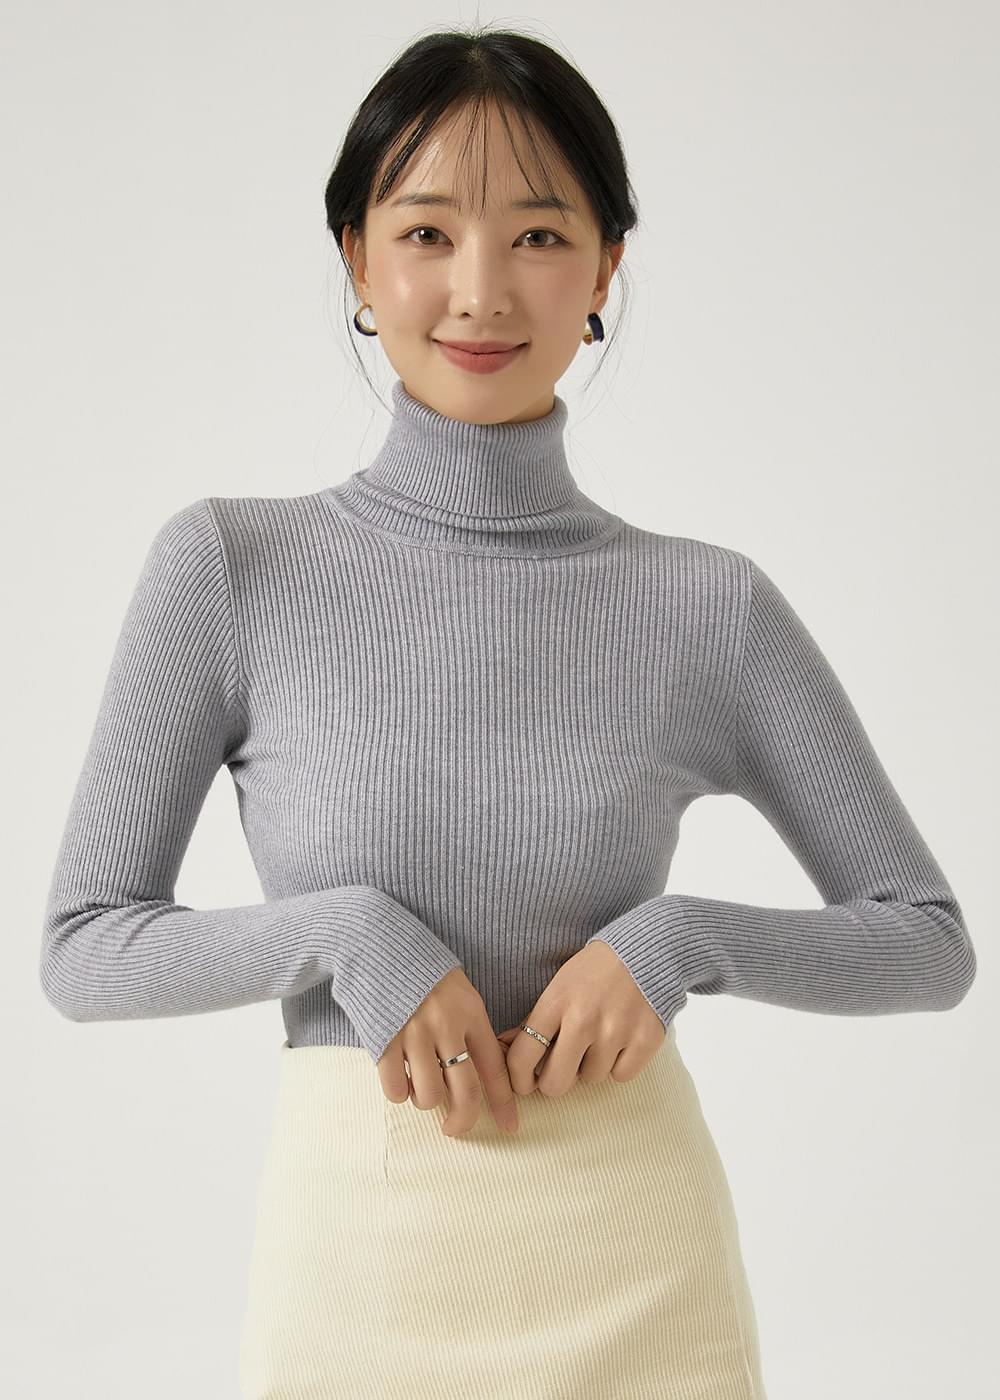 Simple Ribbed Turtleneck Knitwear